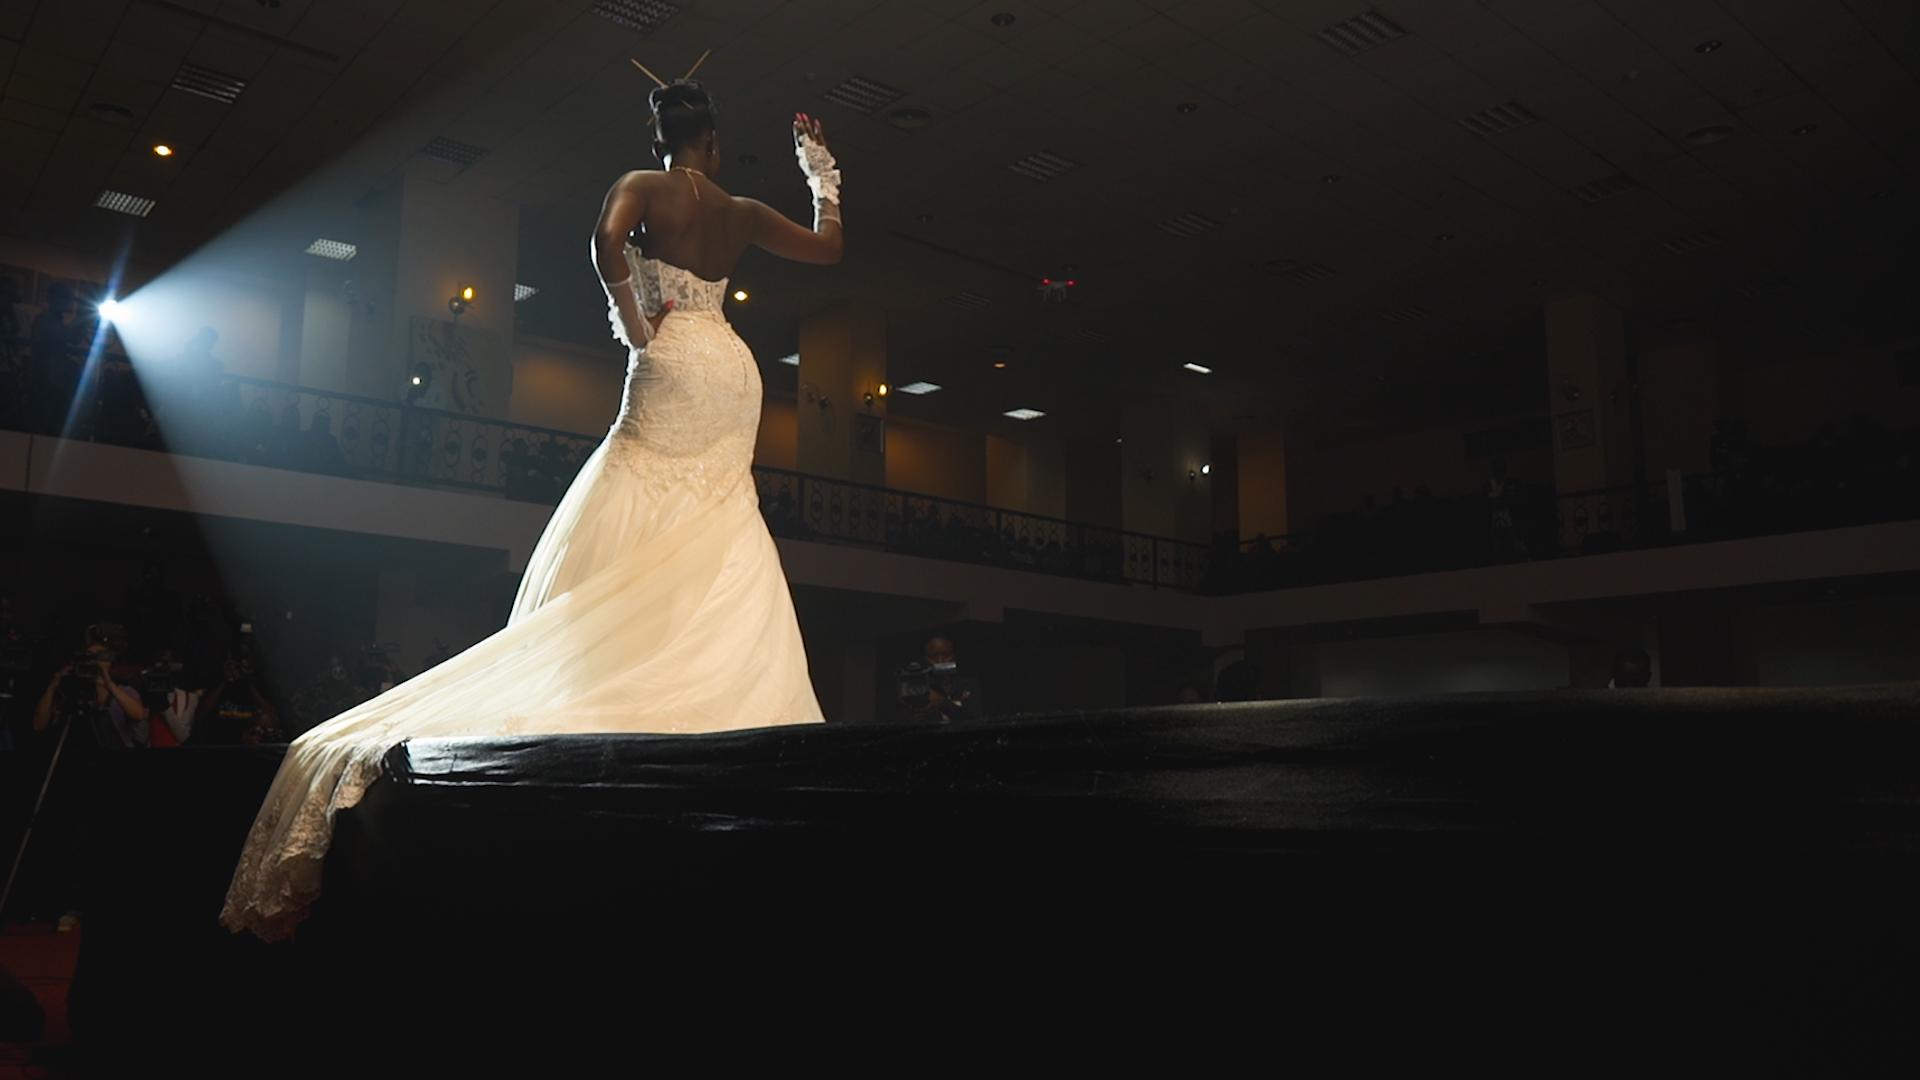 Contestant Two in wedding dress walk0.jpg